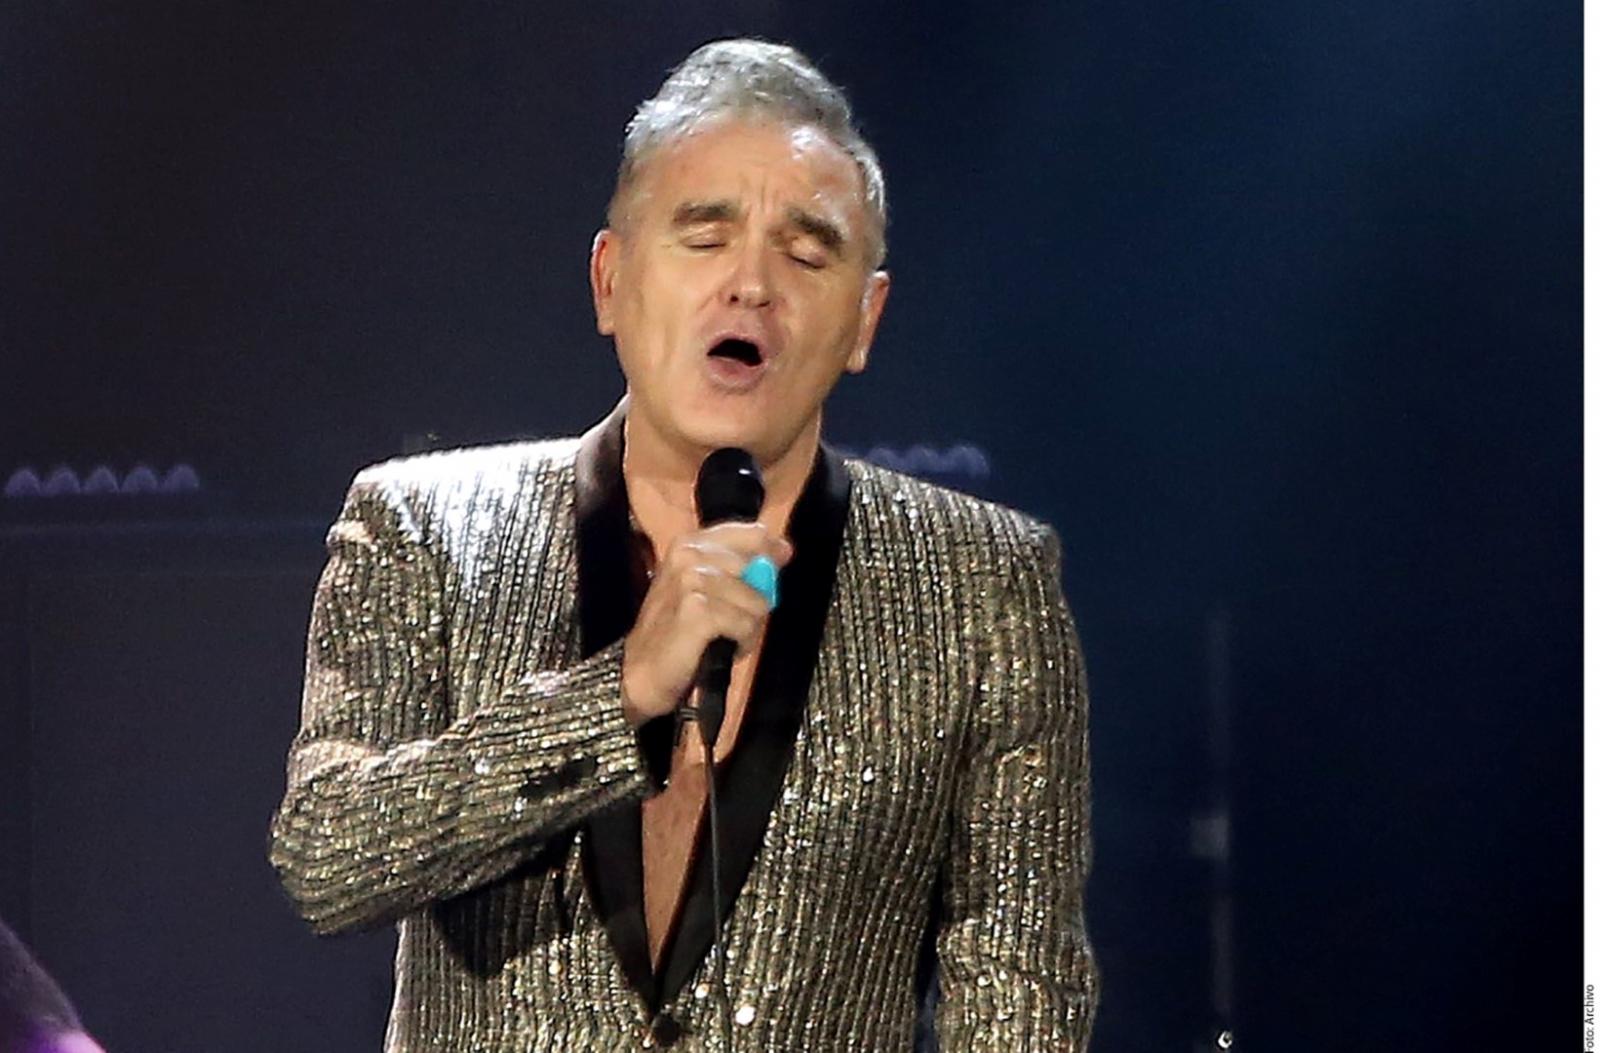 Fans 'enloquecen' con show de Morrissey en TV